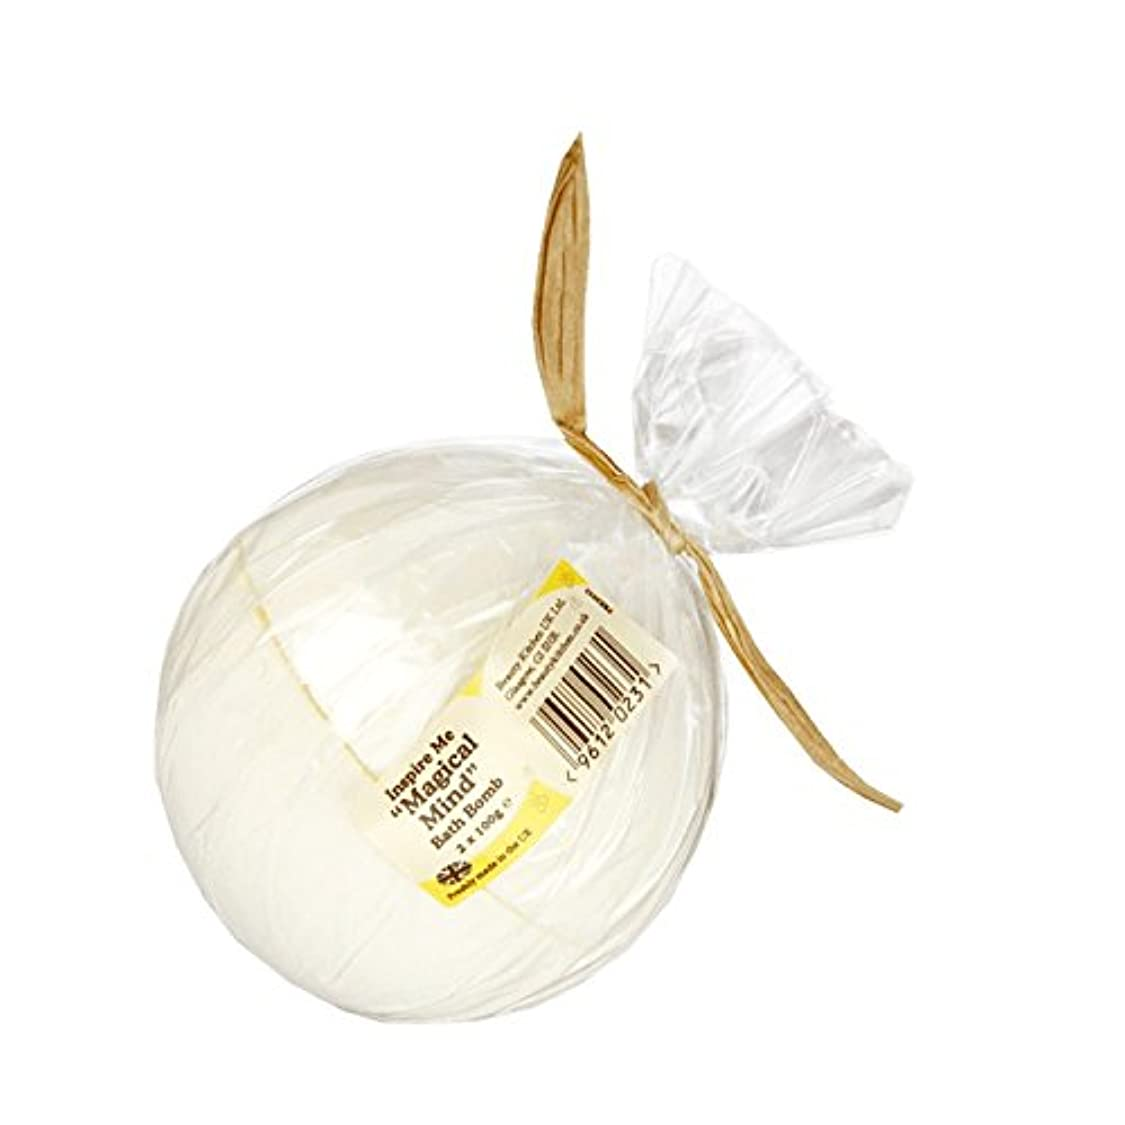 Beauty Kitchen Inspire Me Magical Mind Bath Bomb 2 x 100g (Pack of 2) - 美しさのキッチンは私に魔法心風呂爆弾2×100グラムを鼓舞します (x2)...